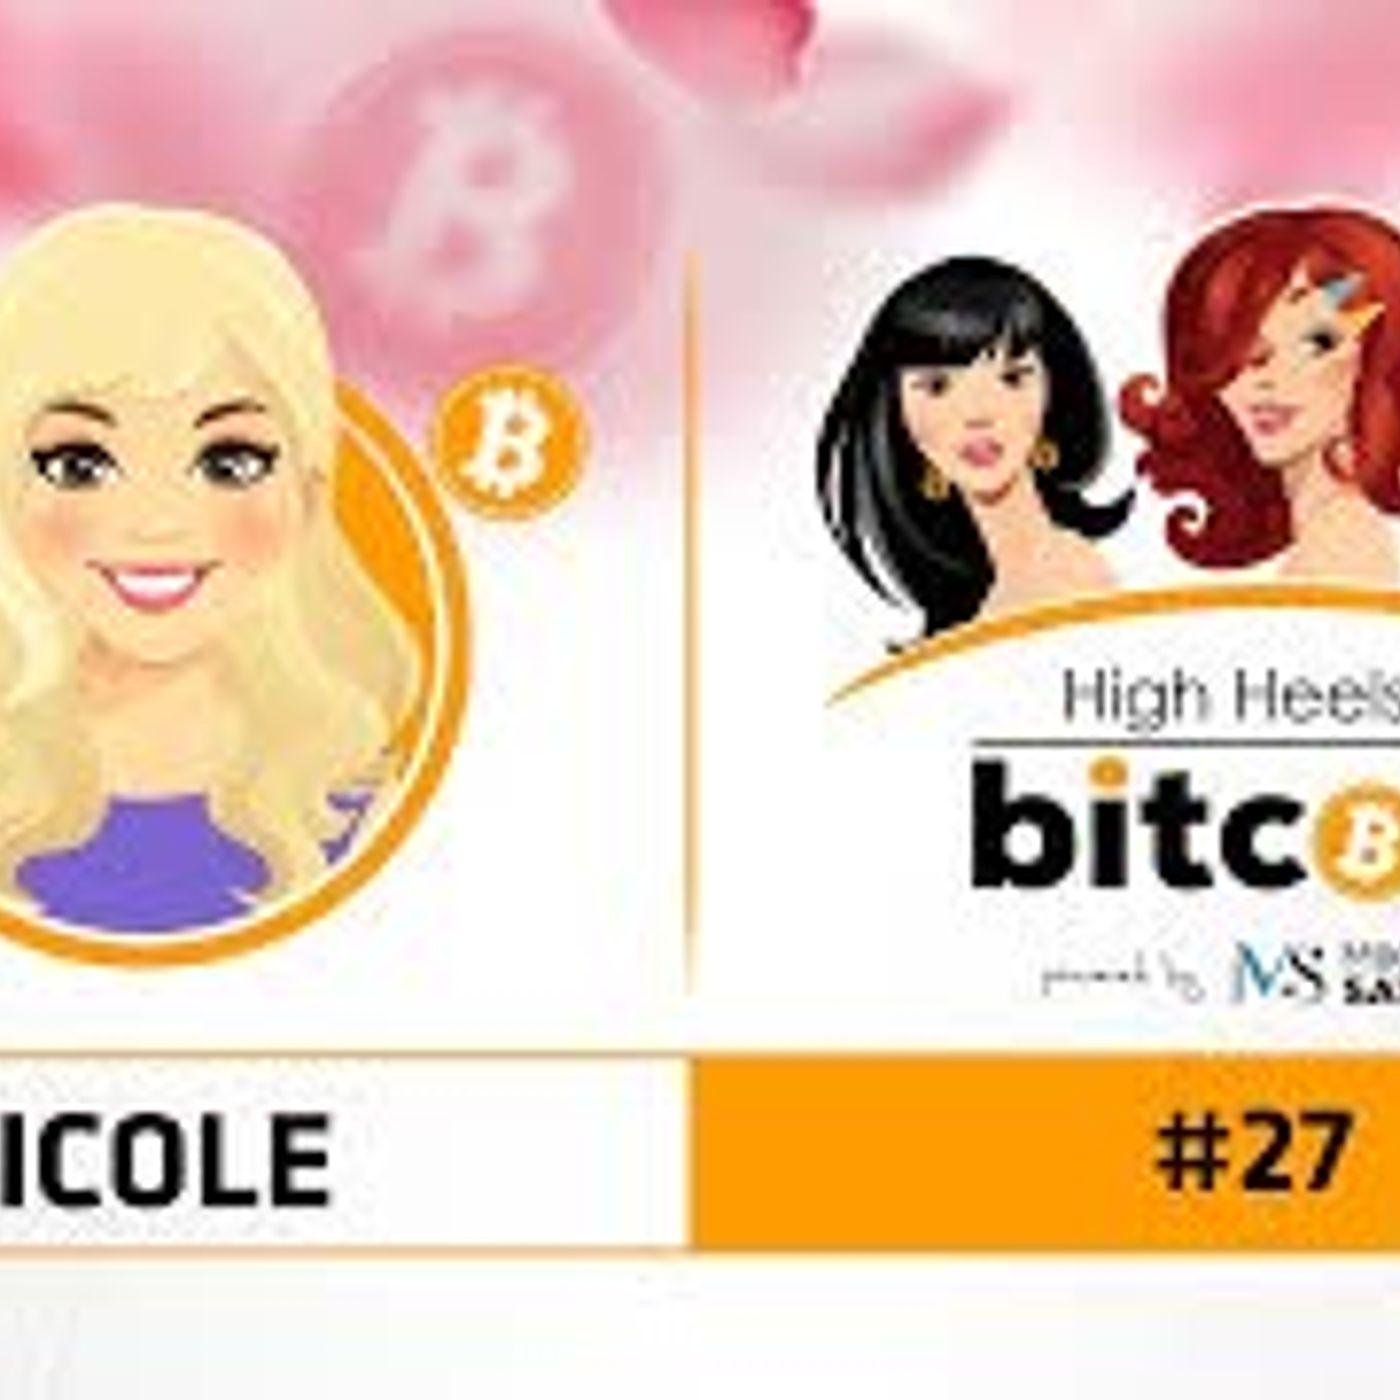 High Heels of Bitcoin #27 | Nicole (NrdGrl007)